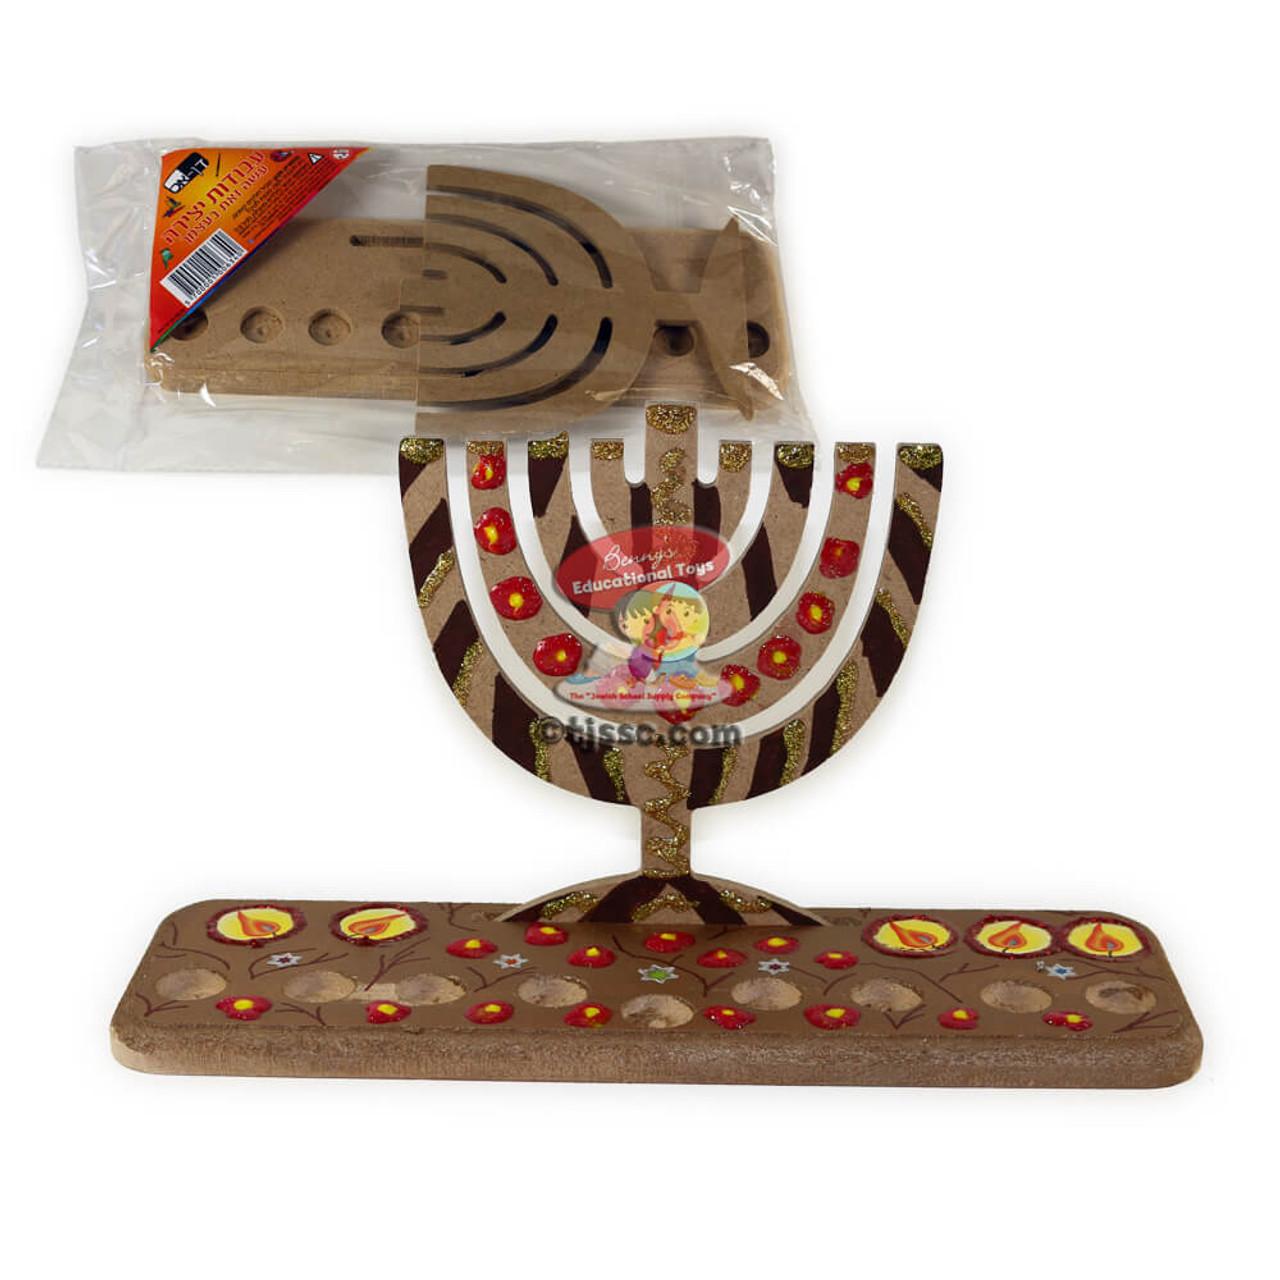 mdf upright hanukkah menorah menorah design d i y craft project